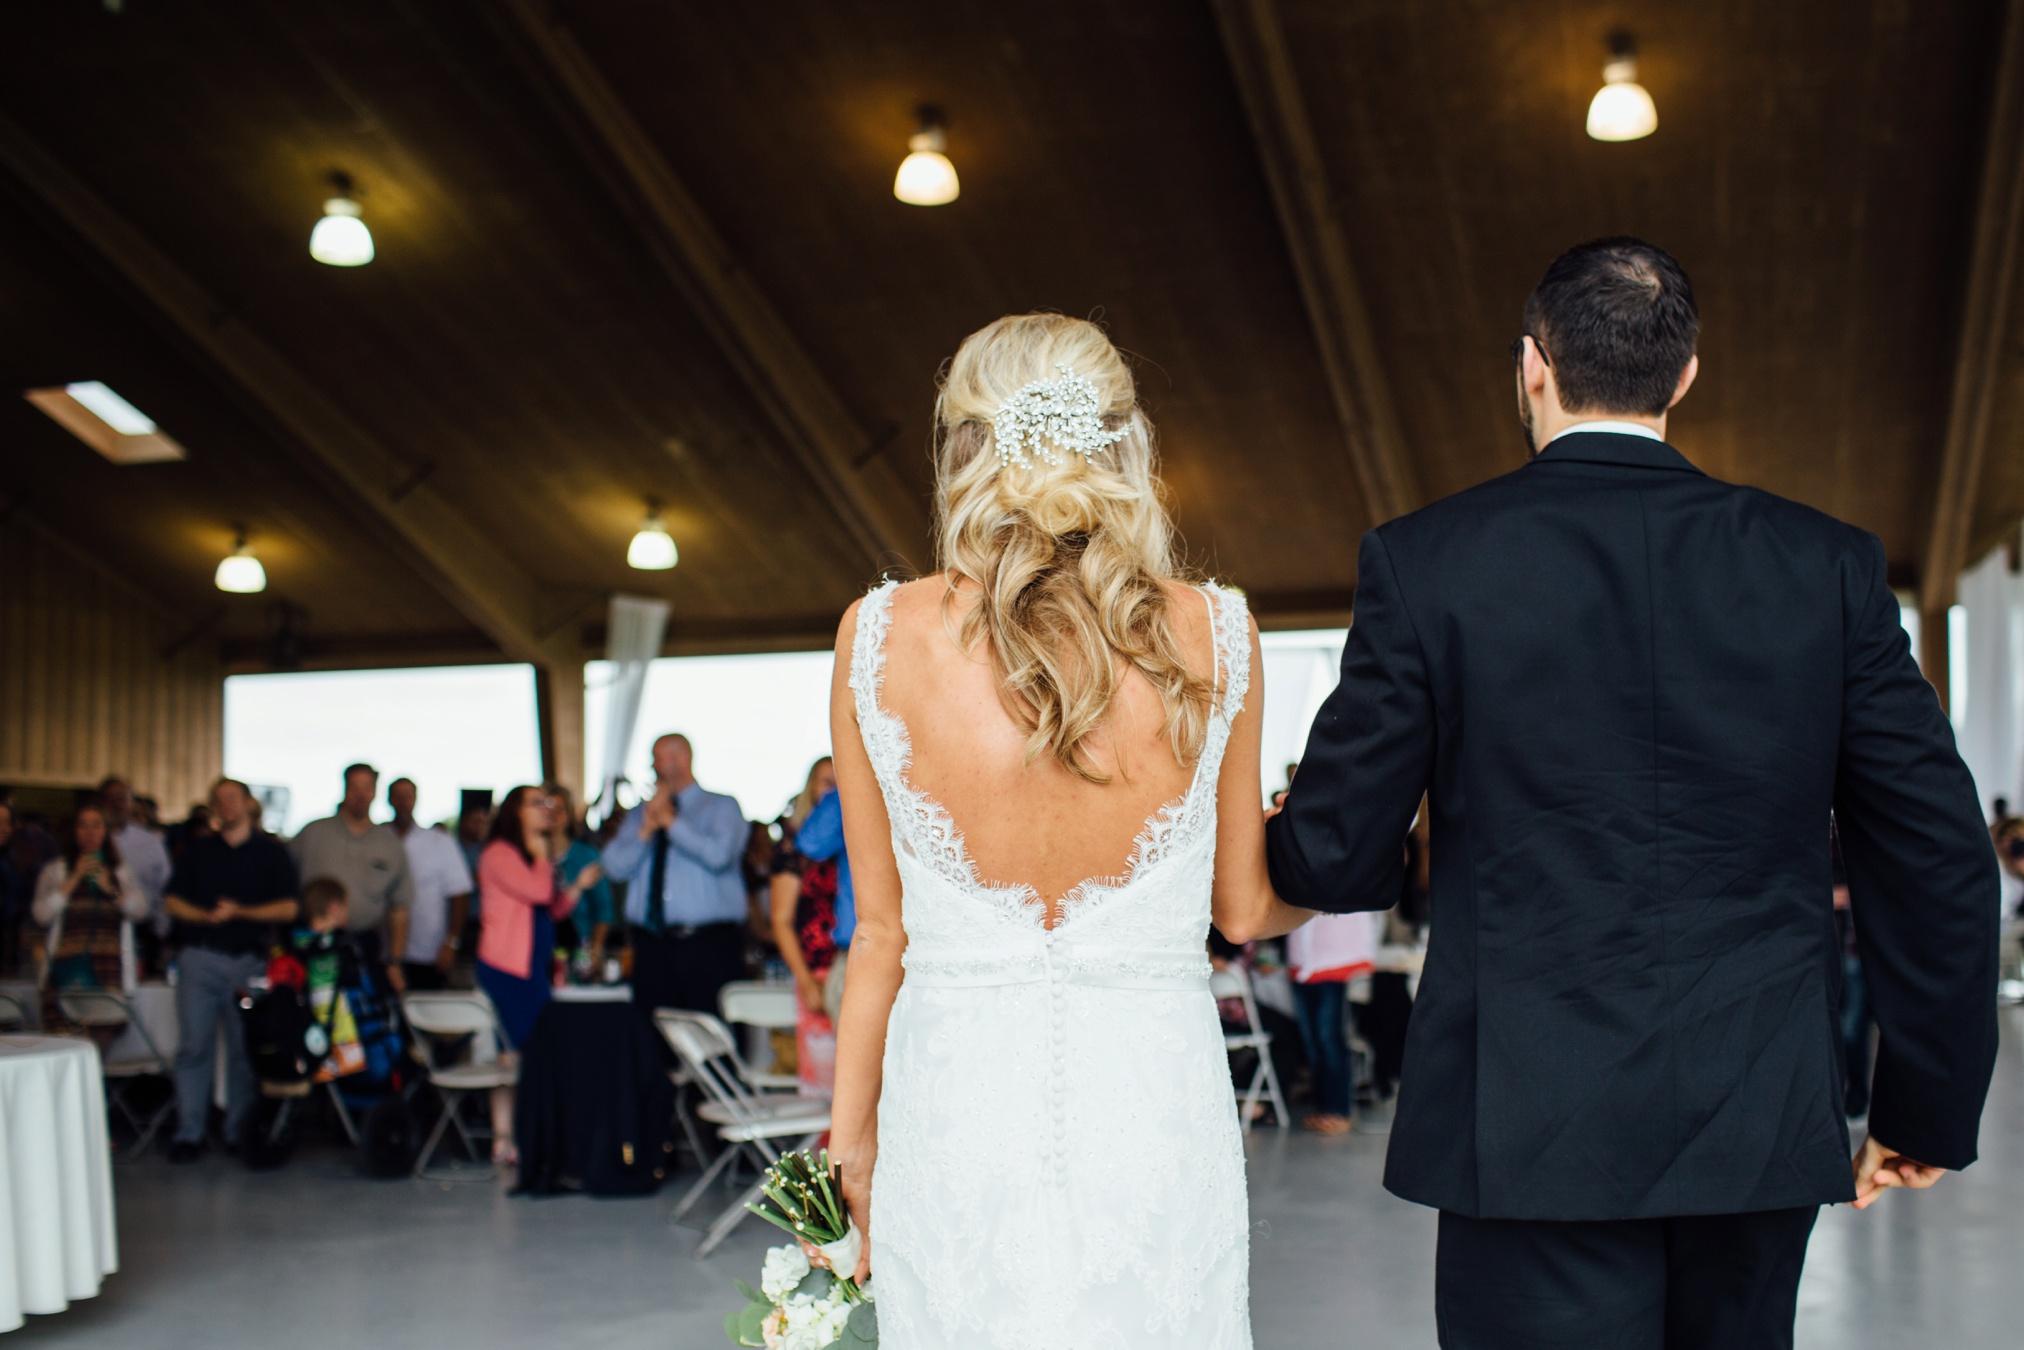 schmid_wedding-686.jpg